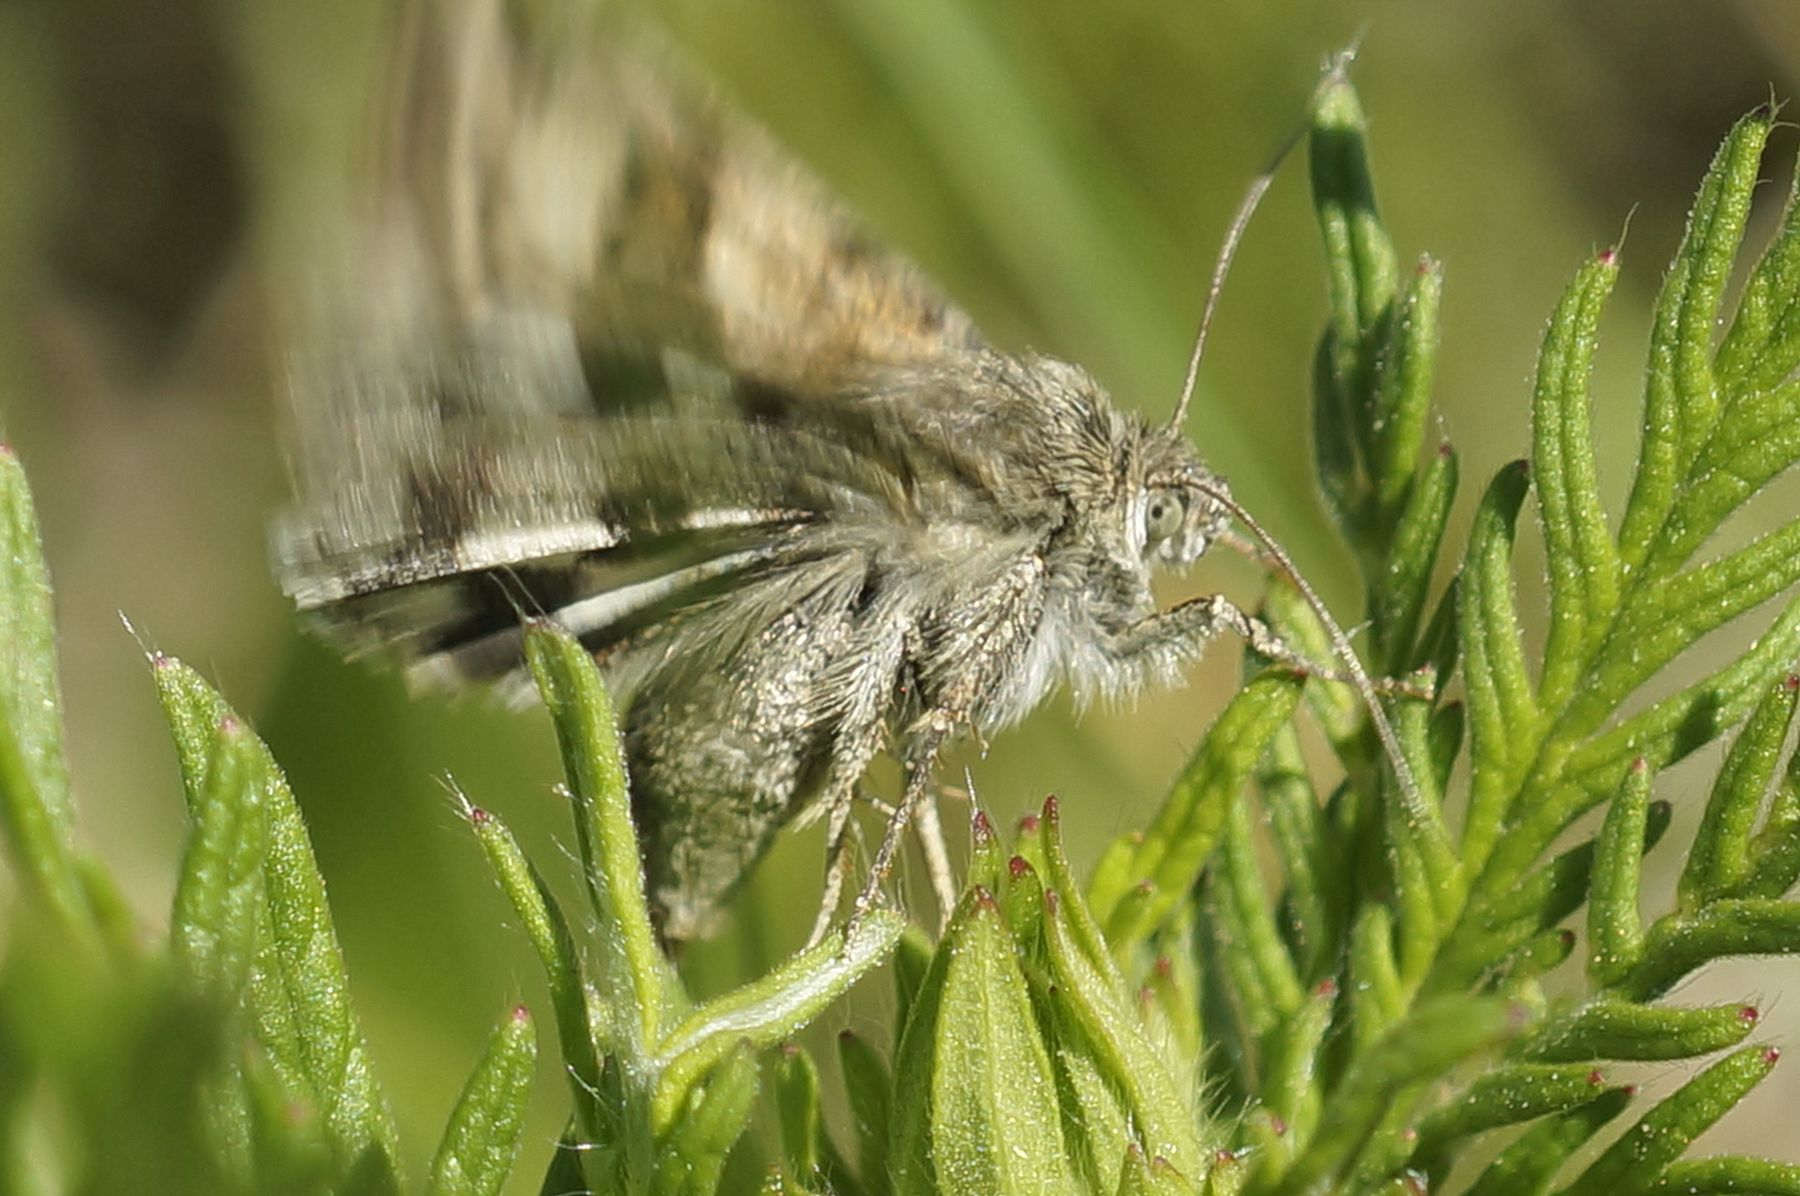 Люцерновая совка люцерновая совка бабочка лето трава лес